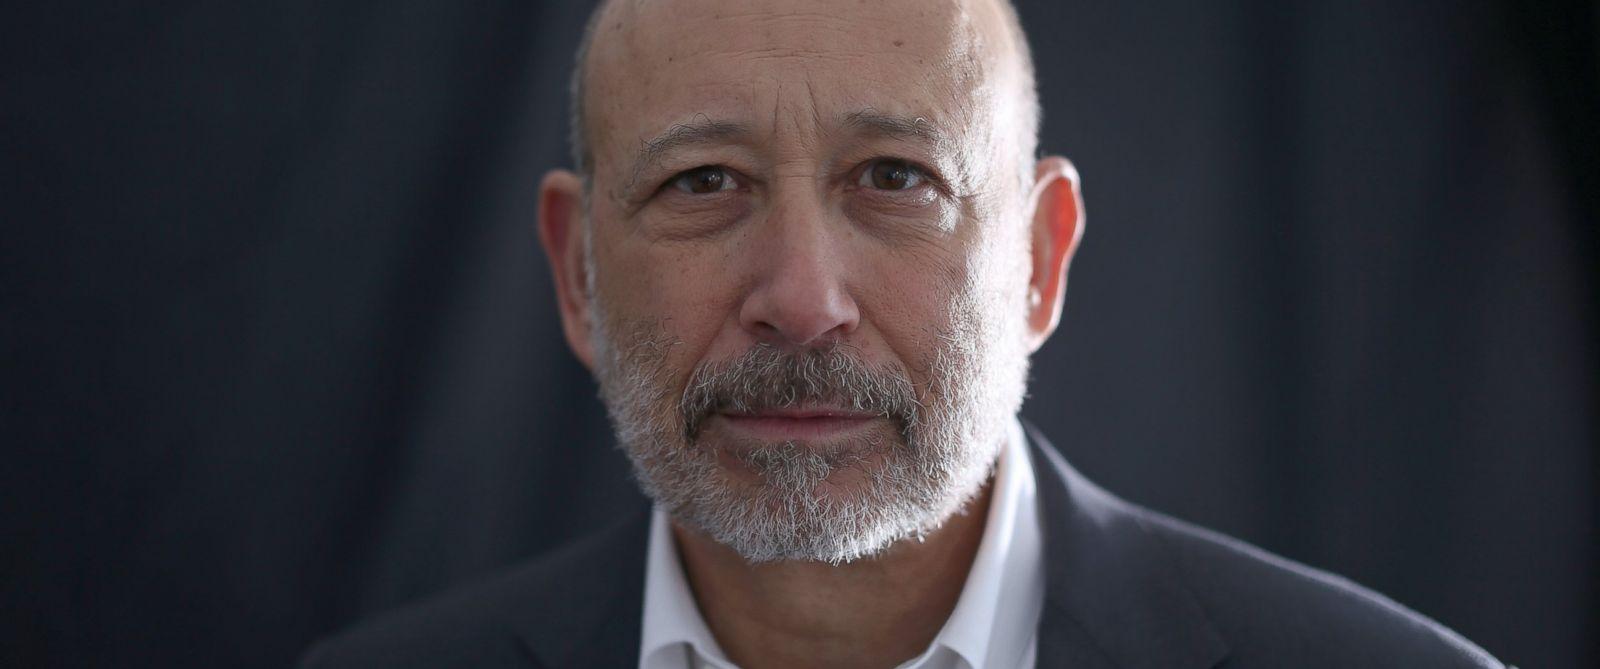 Goldman Sachs, lies and 1MDB - afr.com